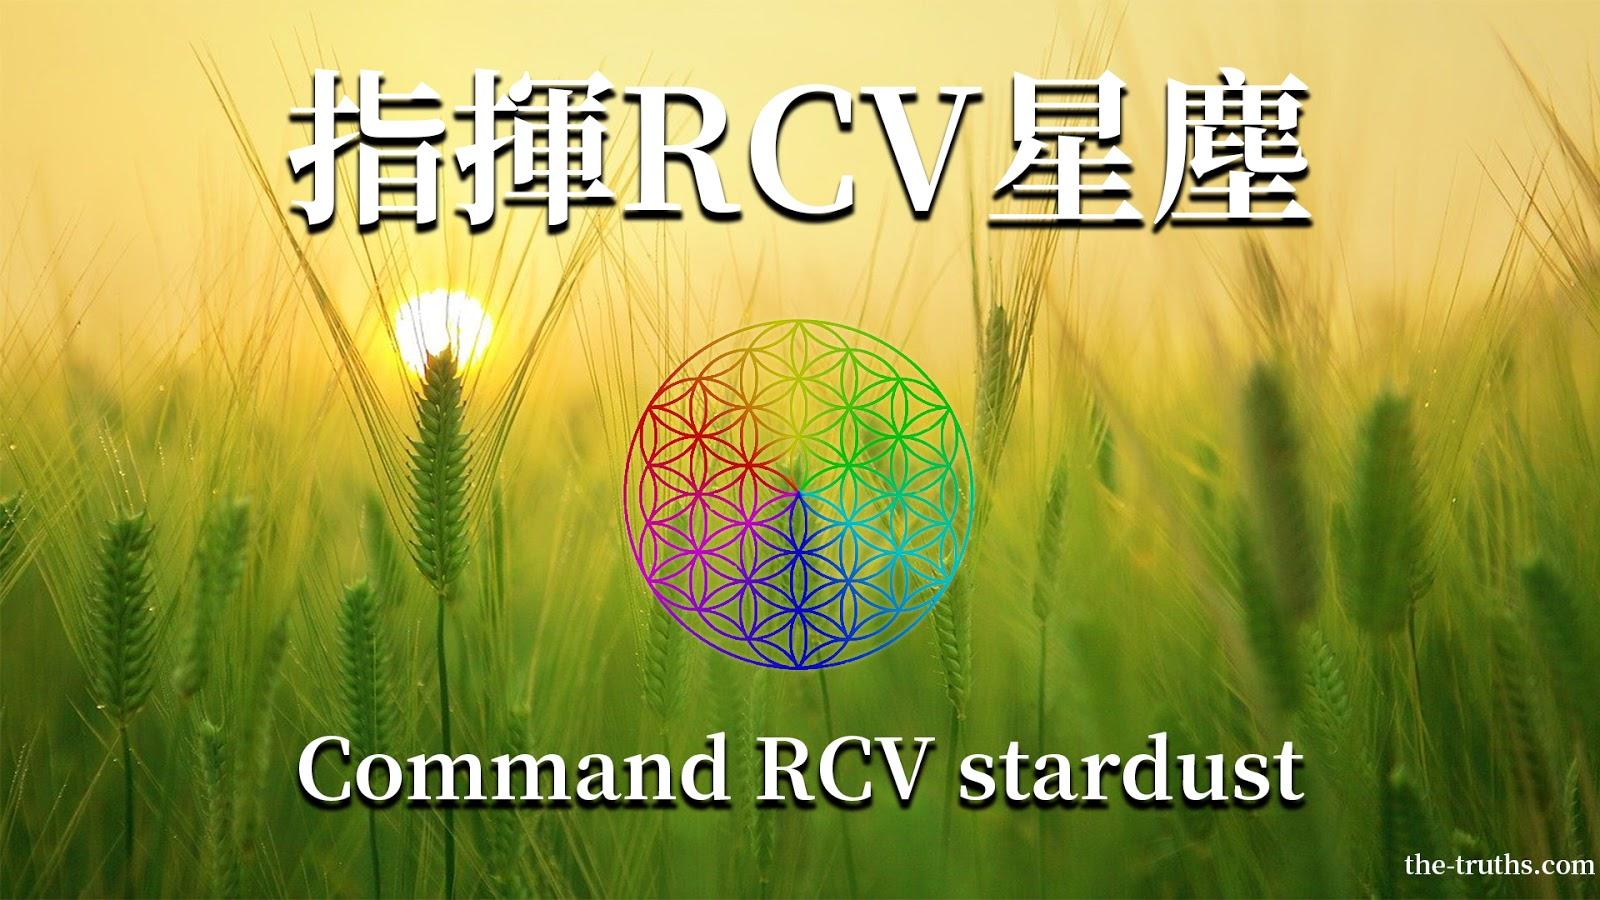 https://1.bp.blogspot.com/-cojWyRMrc3c/XnCNy7J6NqI/AAAAAAAAIkY/hbgxfDSFjjEv1AWSlVTr1bRb7jkfDO2JQCNcBGAsYHQ/s1600/Command%2BRCV%2Bstardust2.jpg